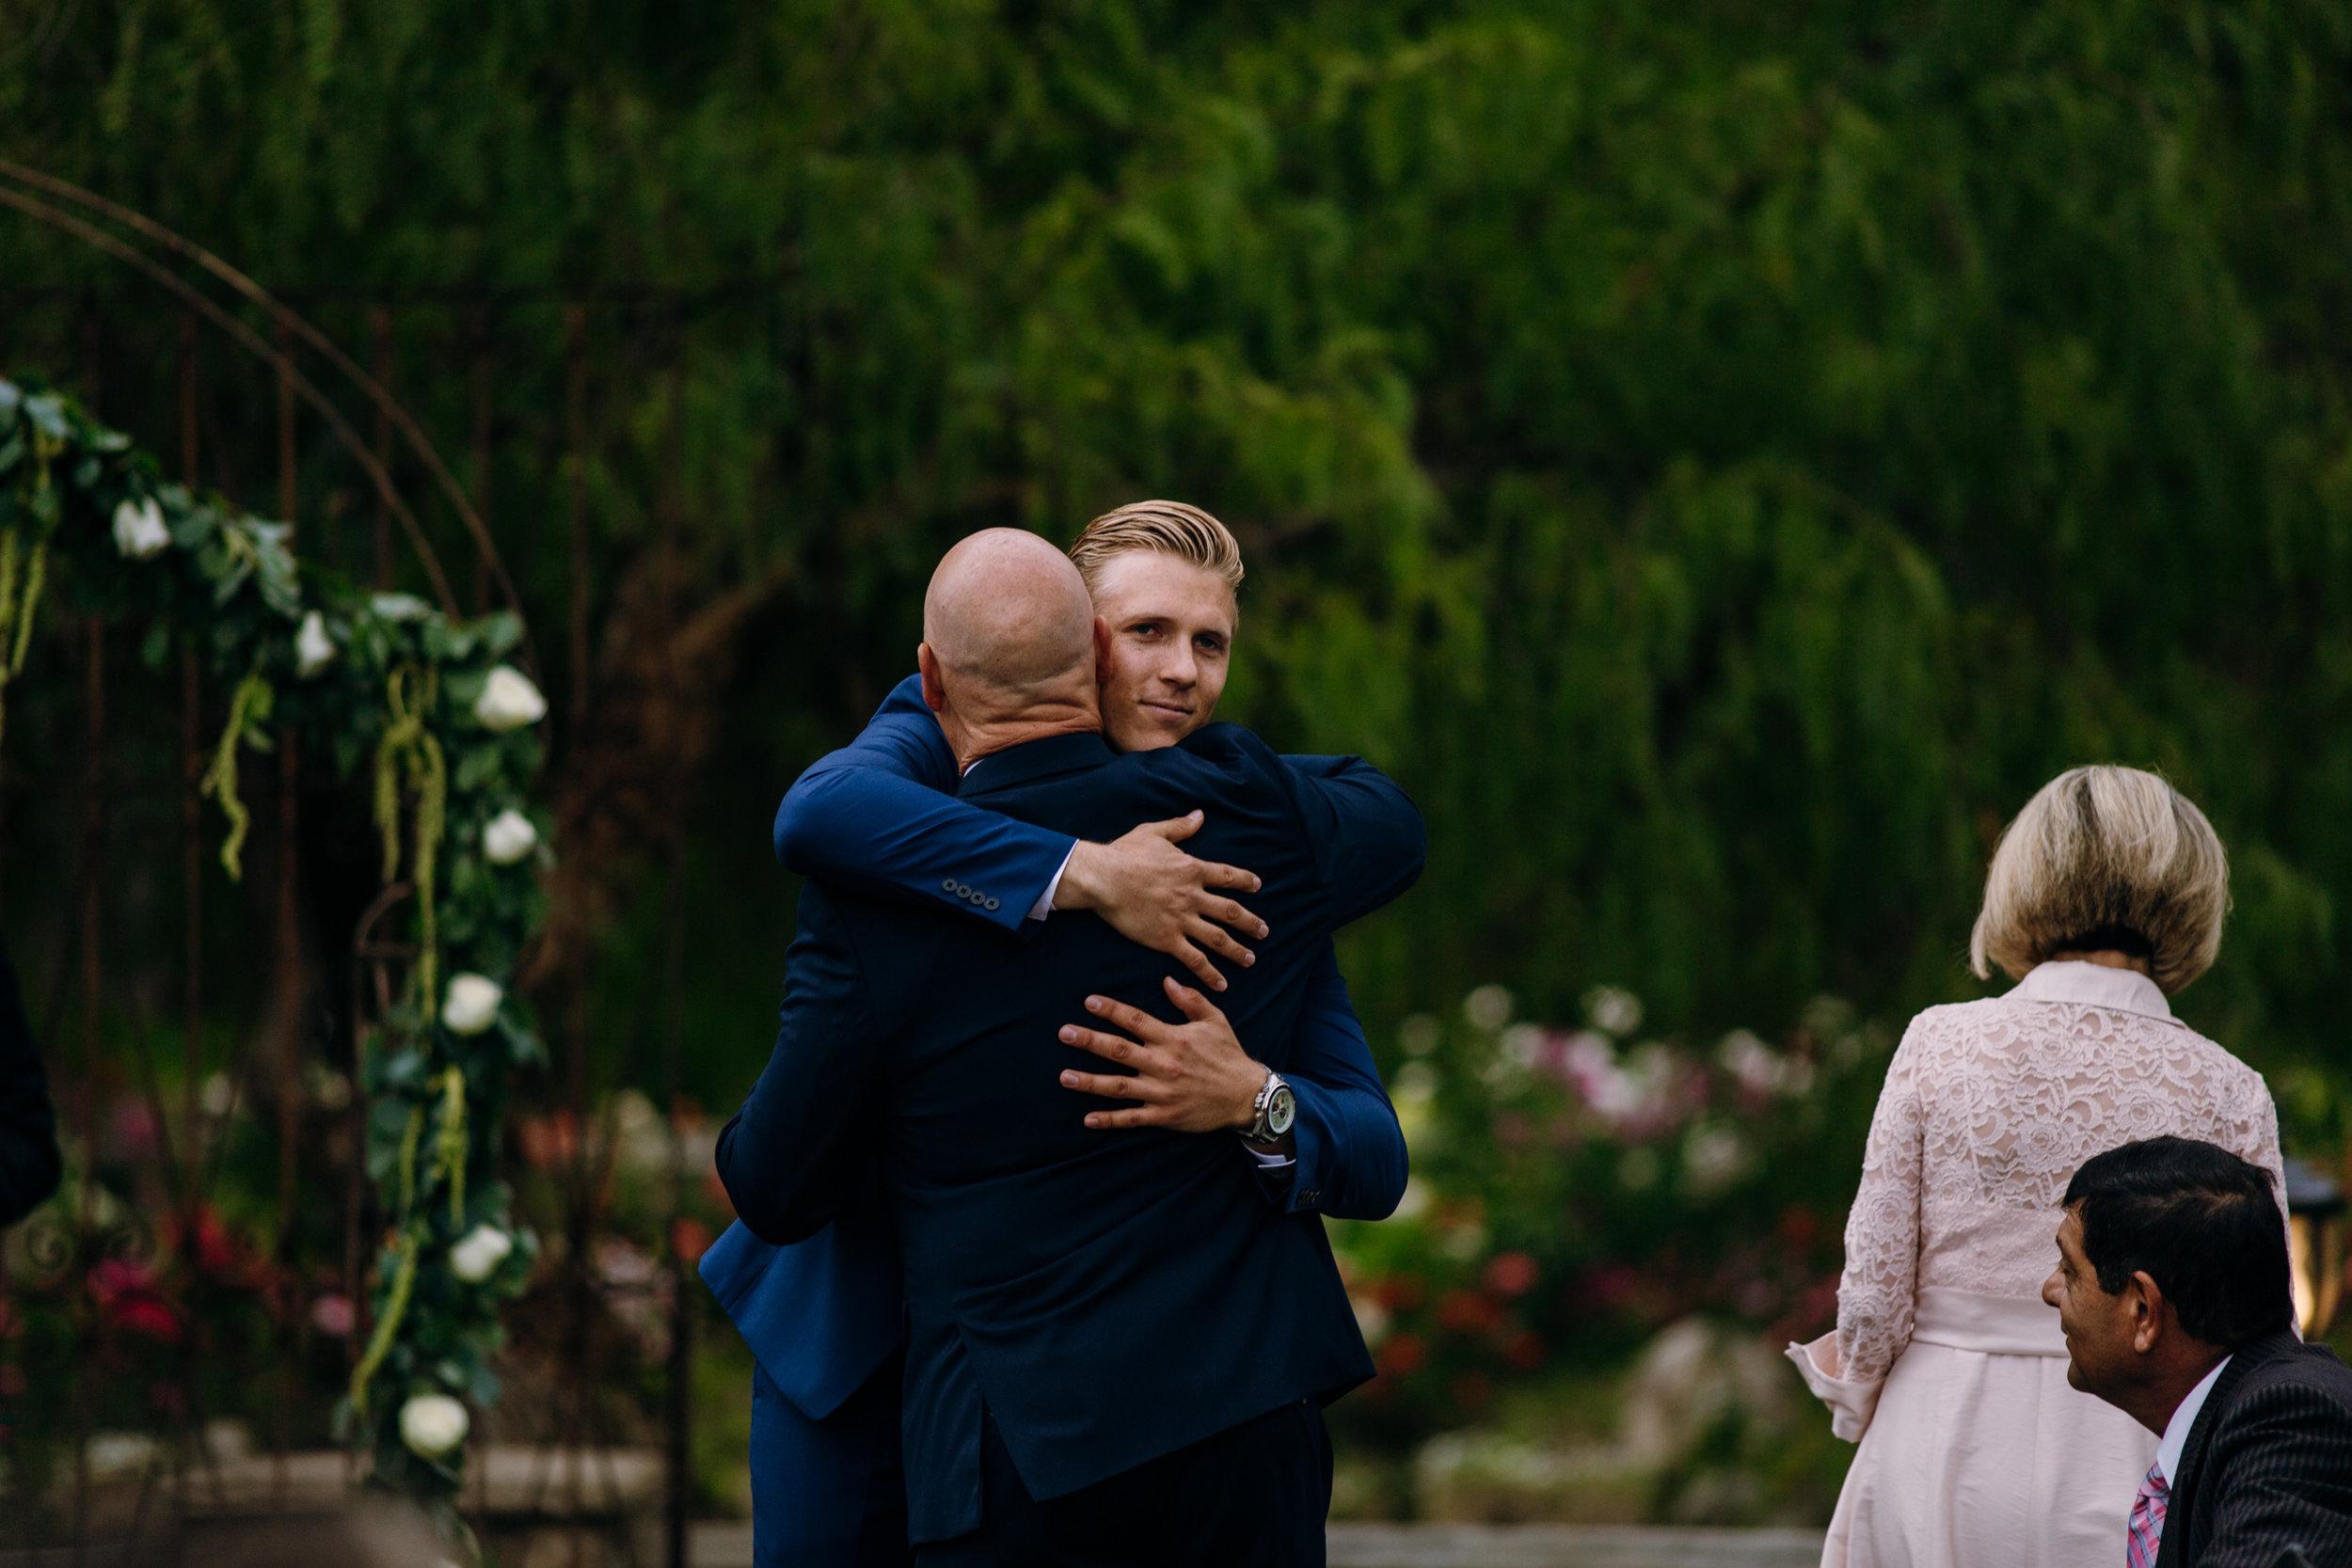 KaraNixonWeddings-LakeOakMeadows-Temecula-Wedding-26.jpg